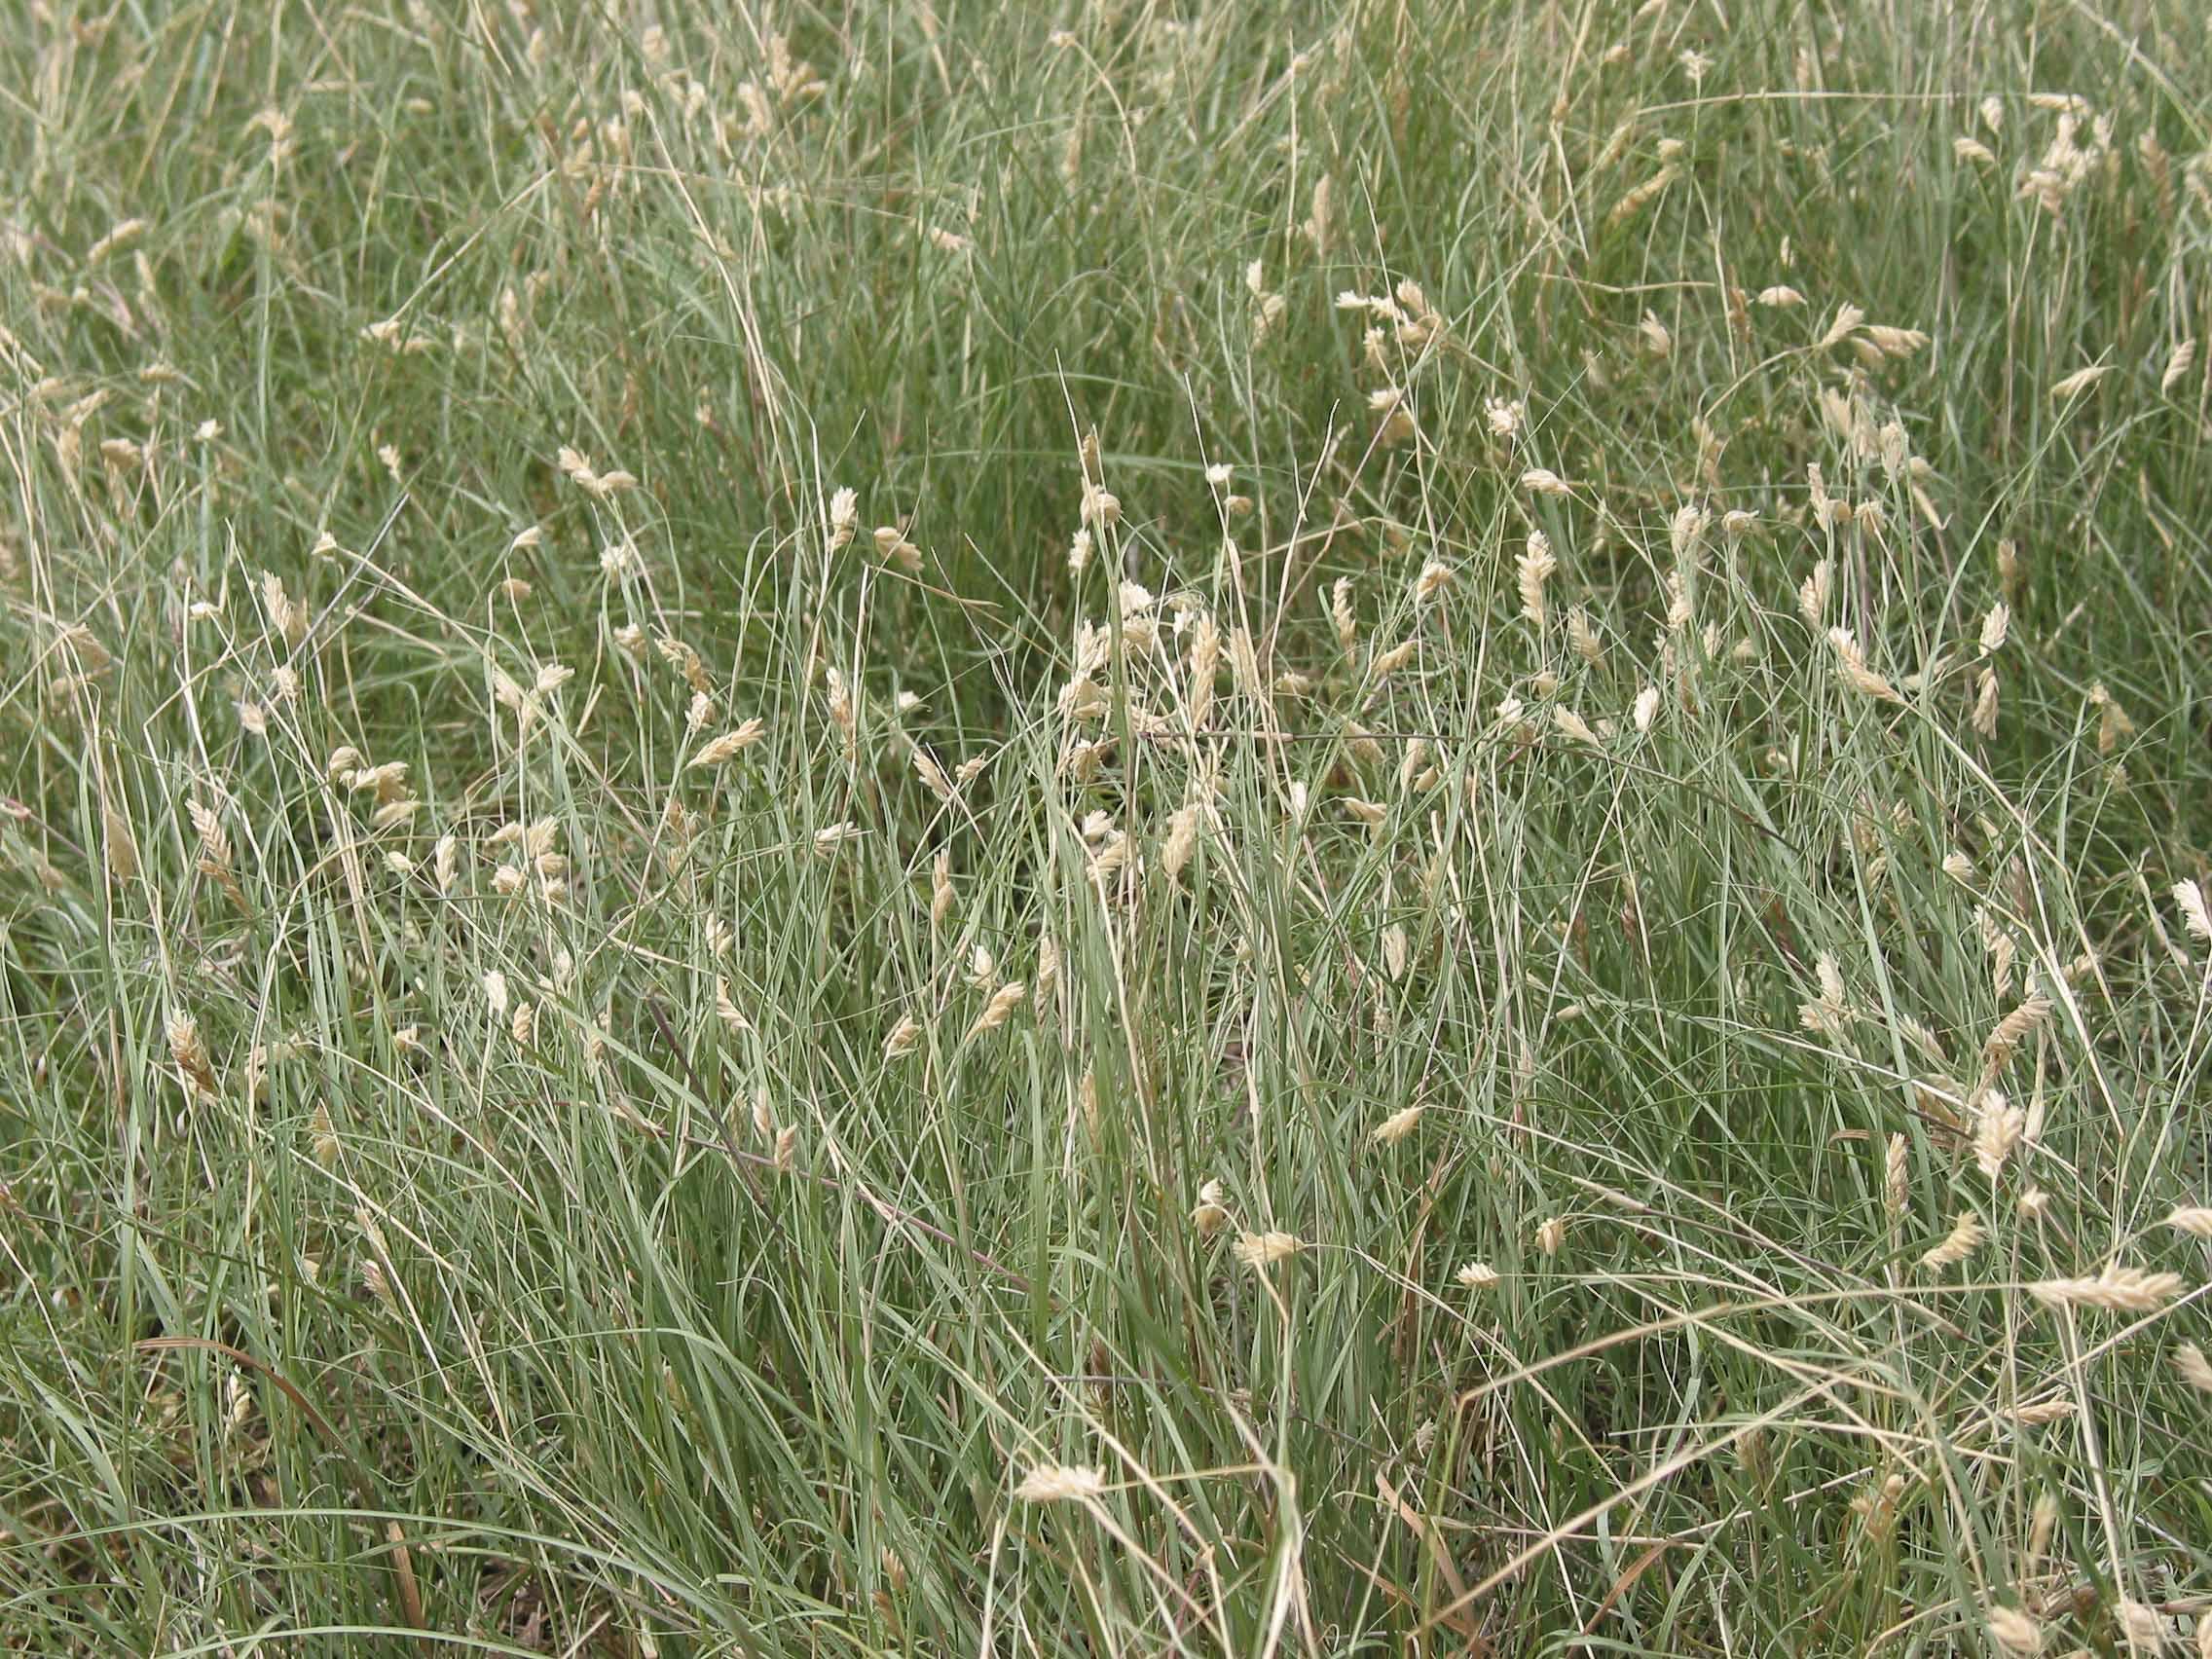 Buffalograss